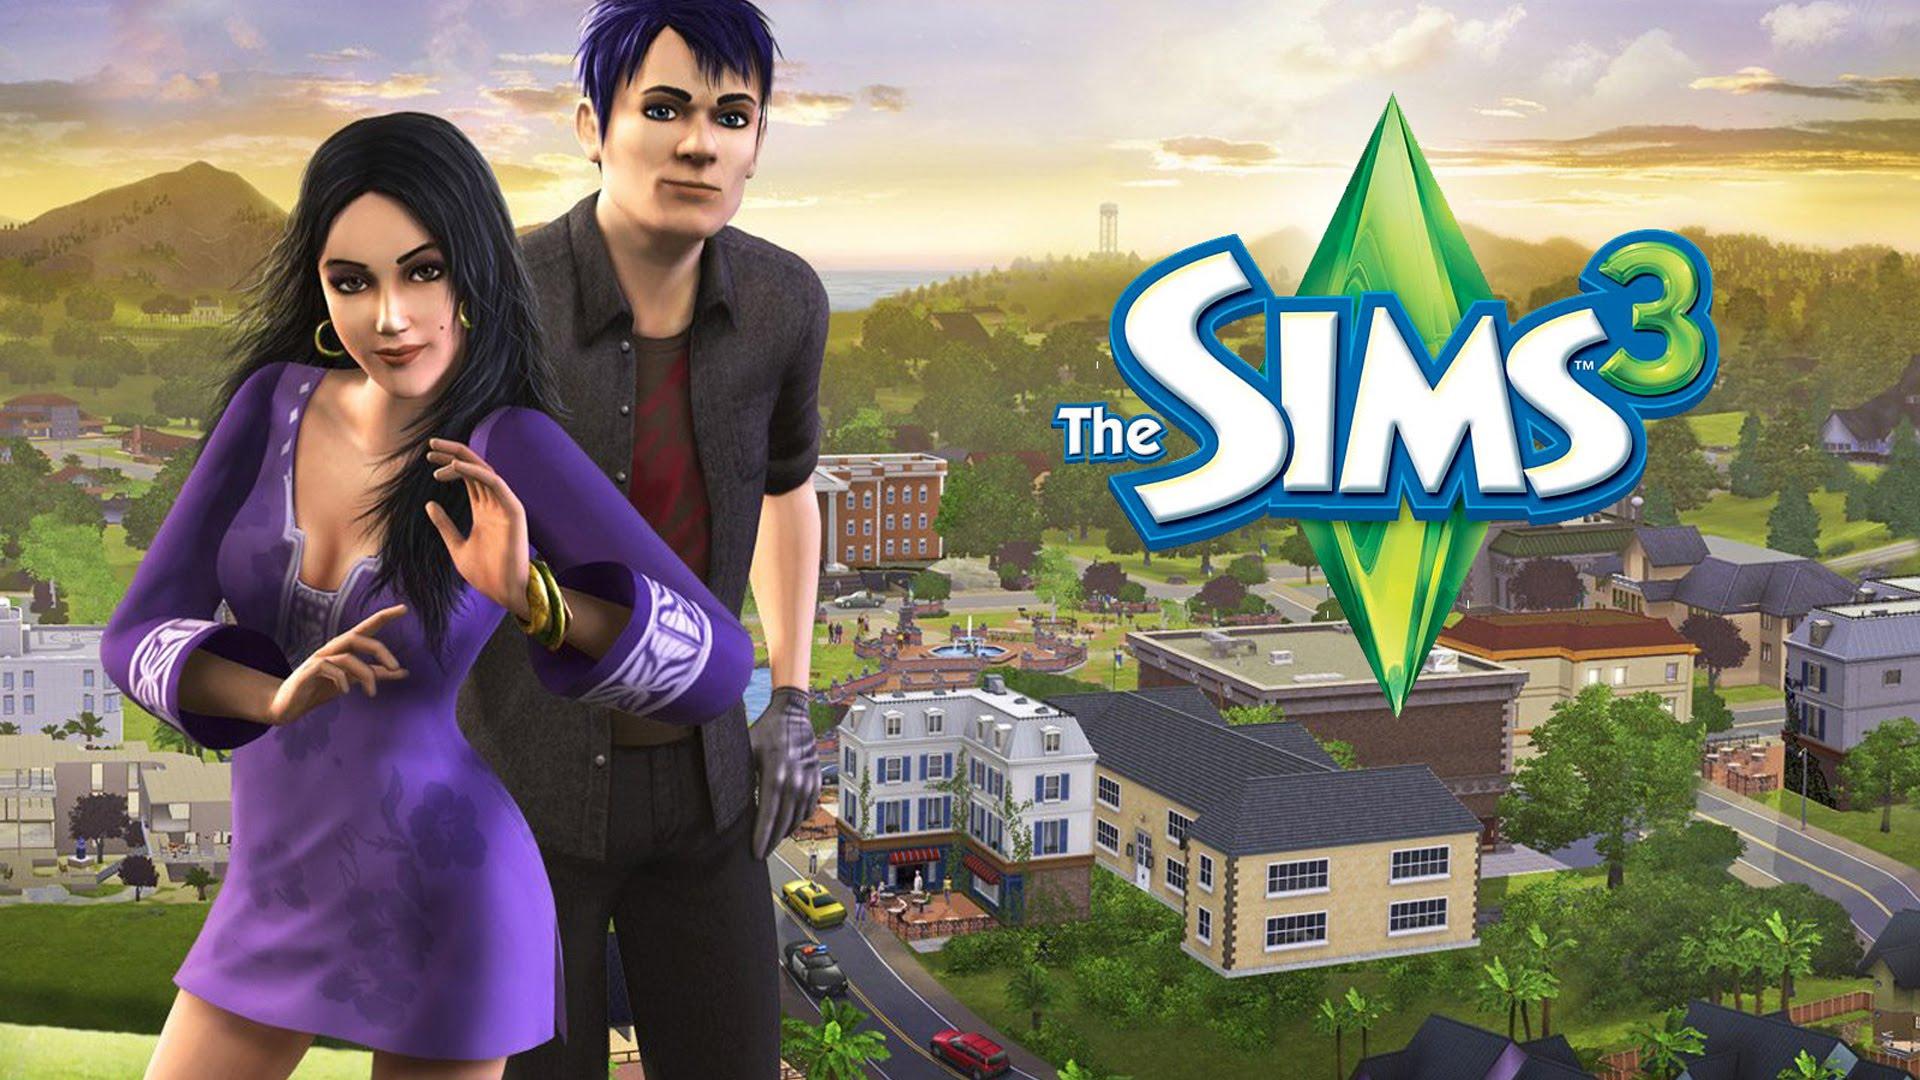 The sims 3 + Бонус игры + Гарантия